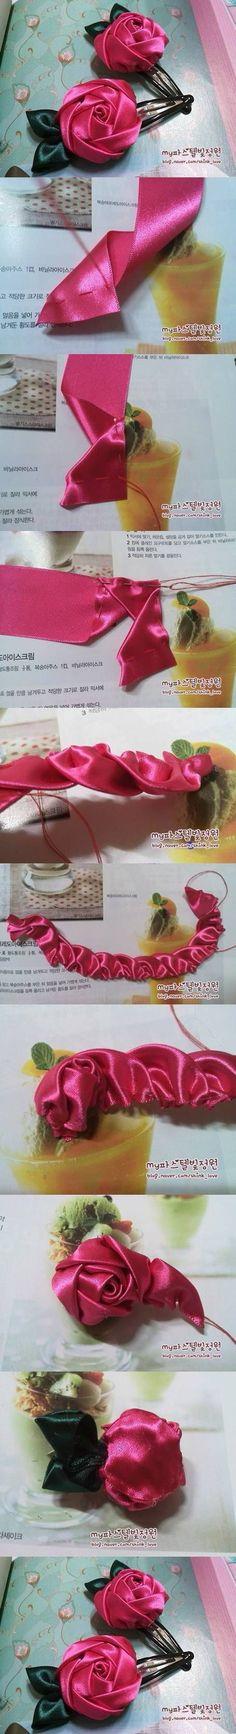 DIY Rose of Organza Ribbon DIY Projects / UsefulDIY.com on imgfave